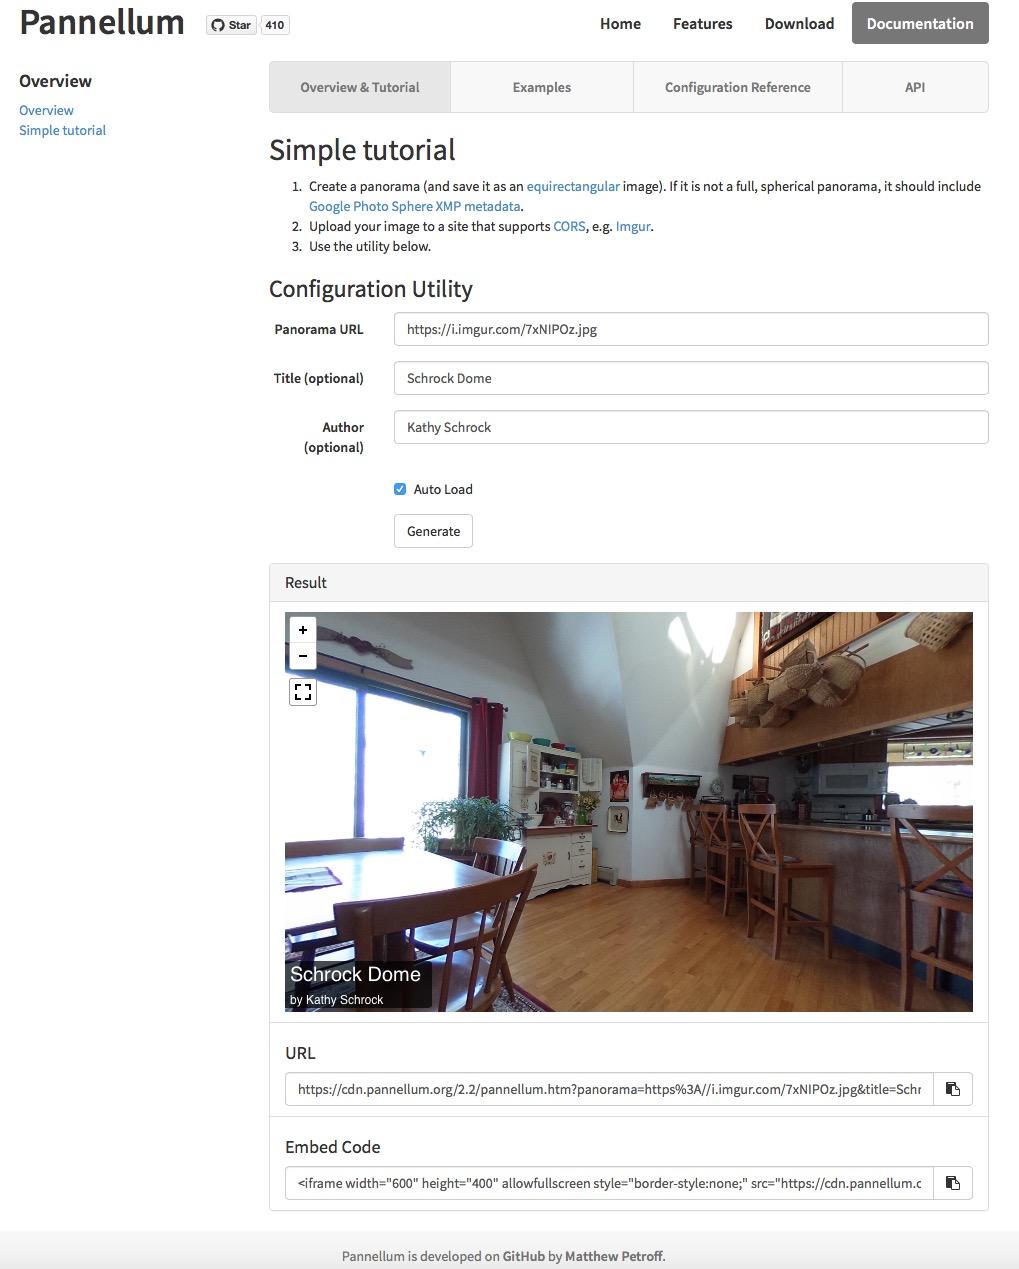 Kathy Schrock's Kaffeeklatsch: Ricoh Theta S image hosting